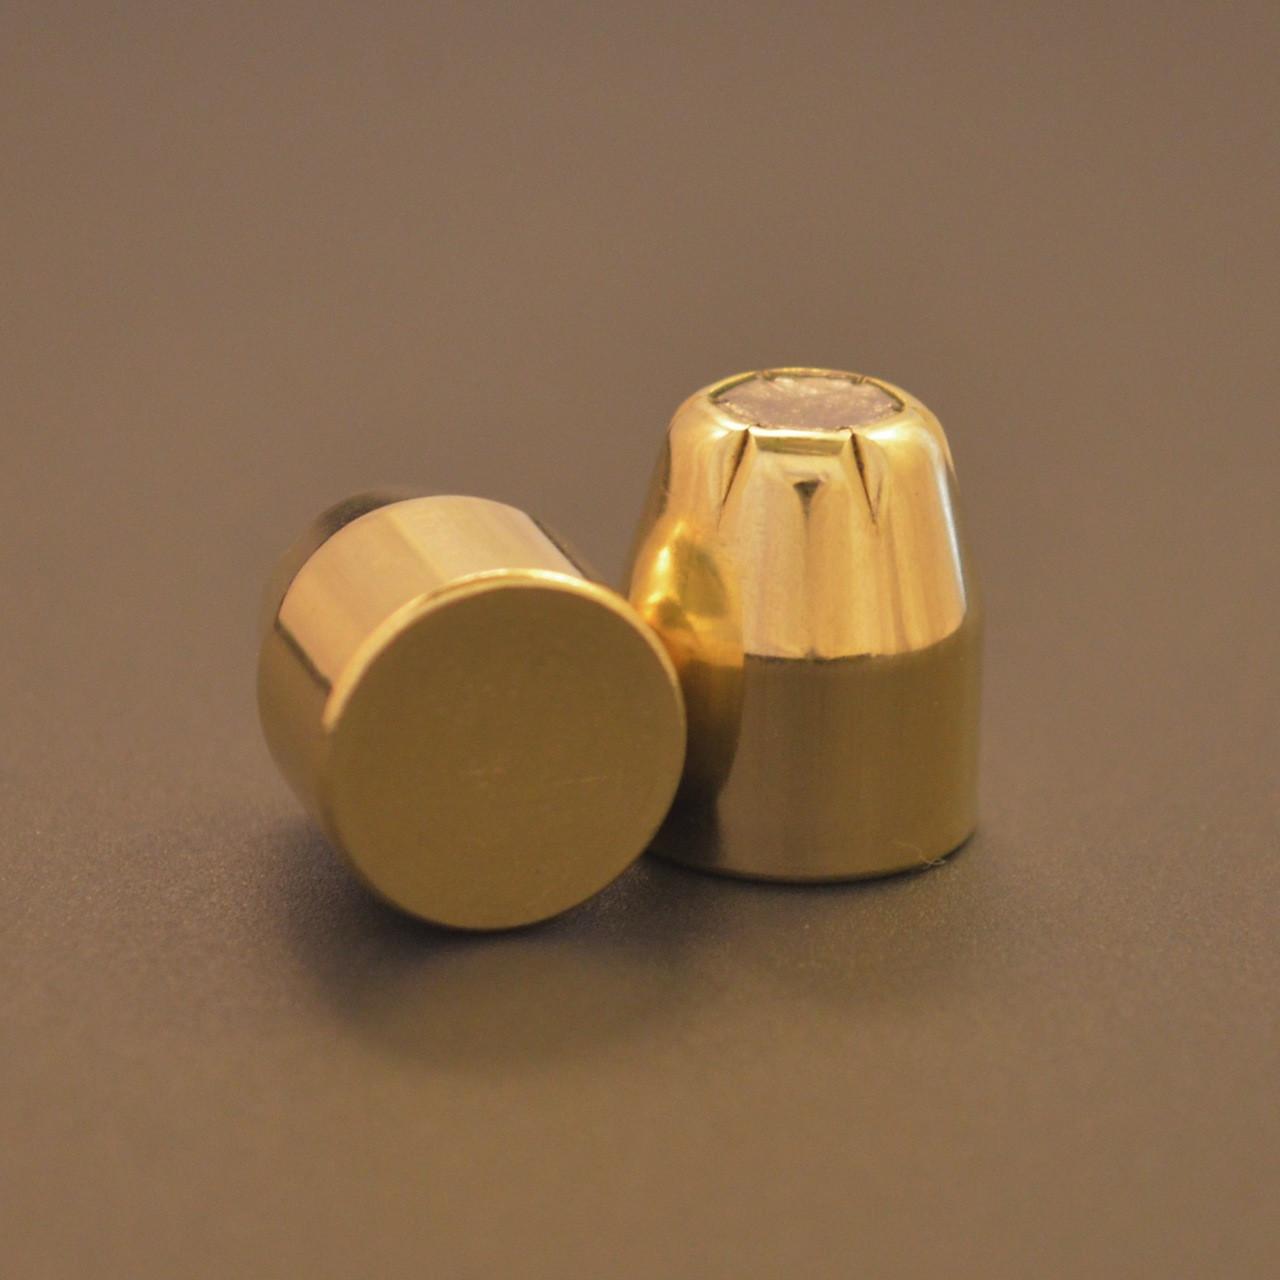 .45/185gr JHP - 500ct